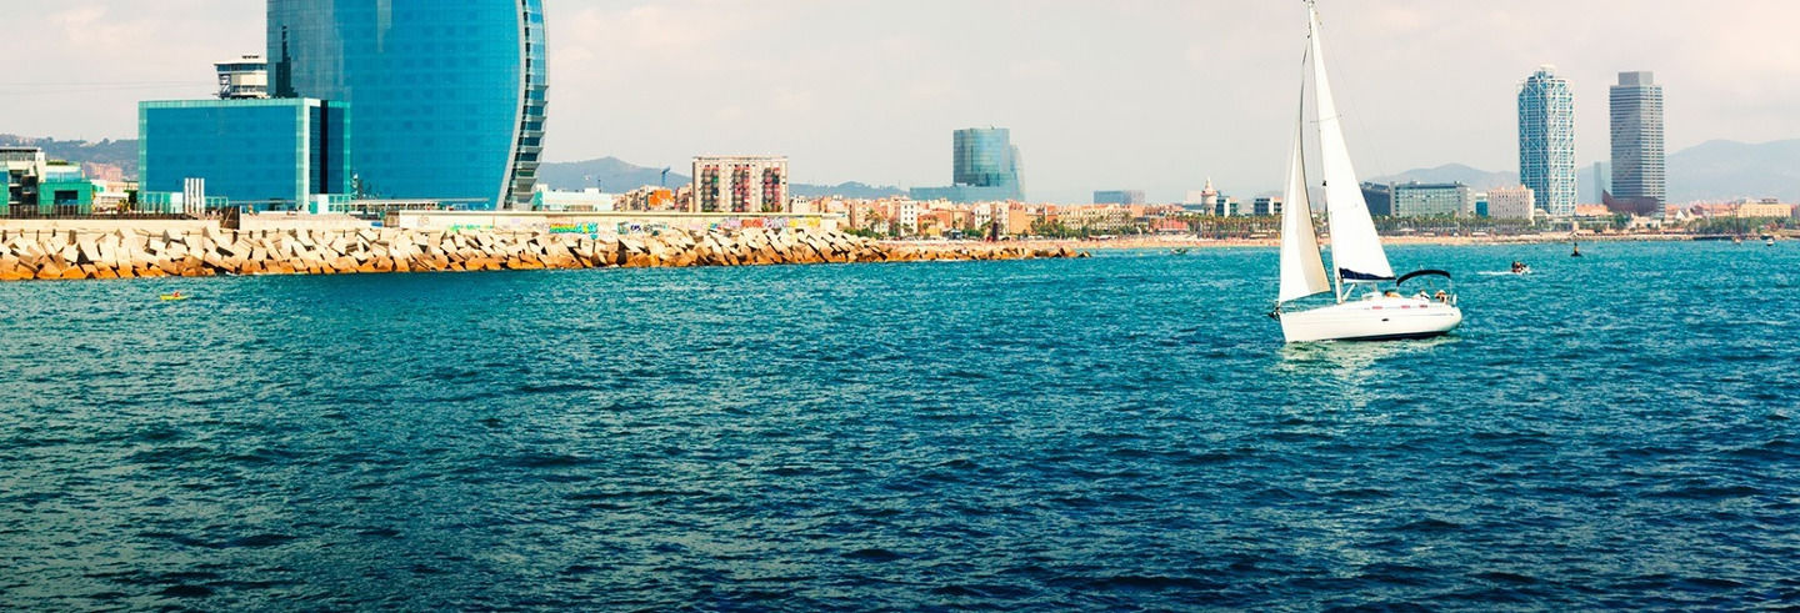 Paseo en velero por Barcelona